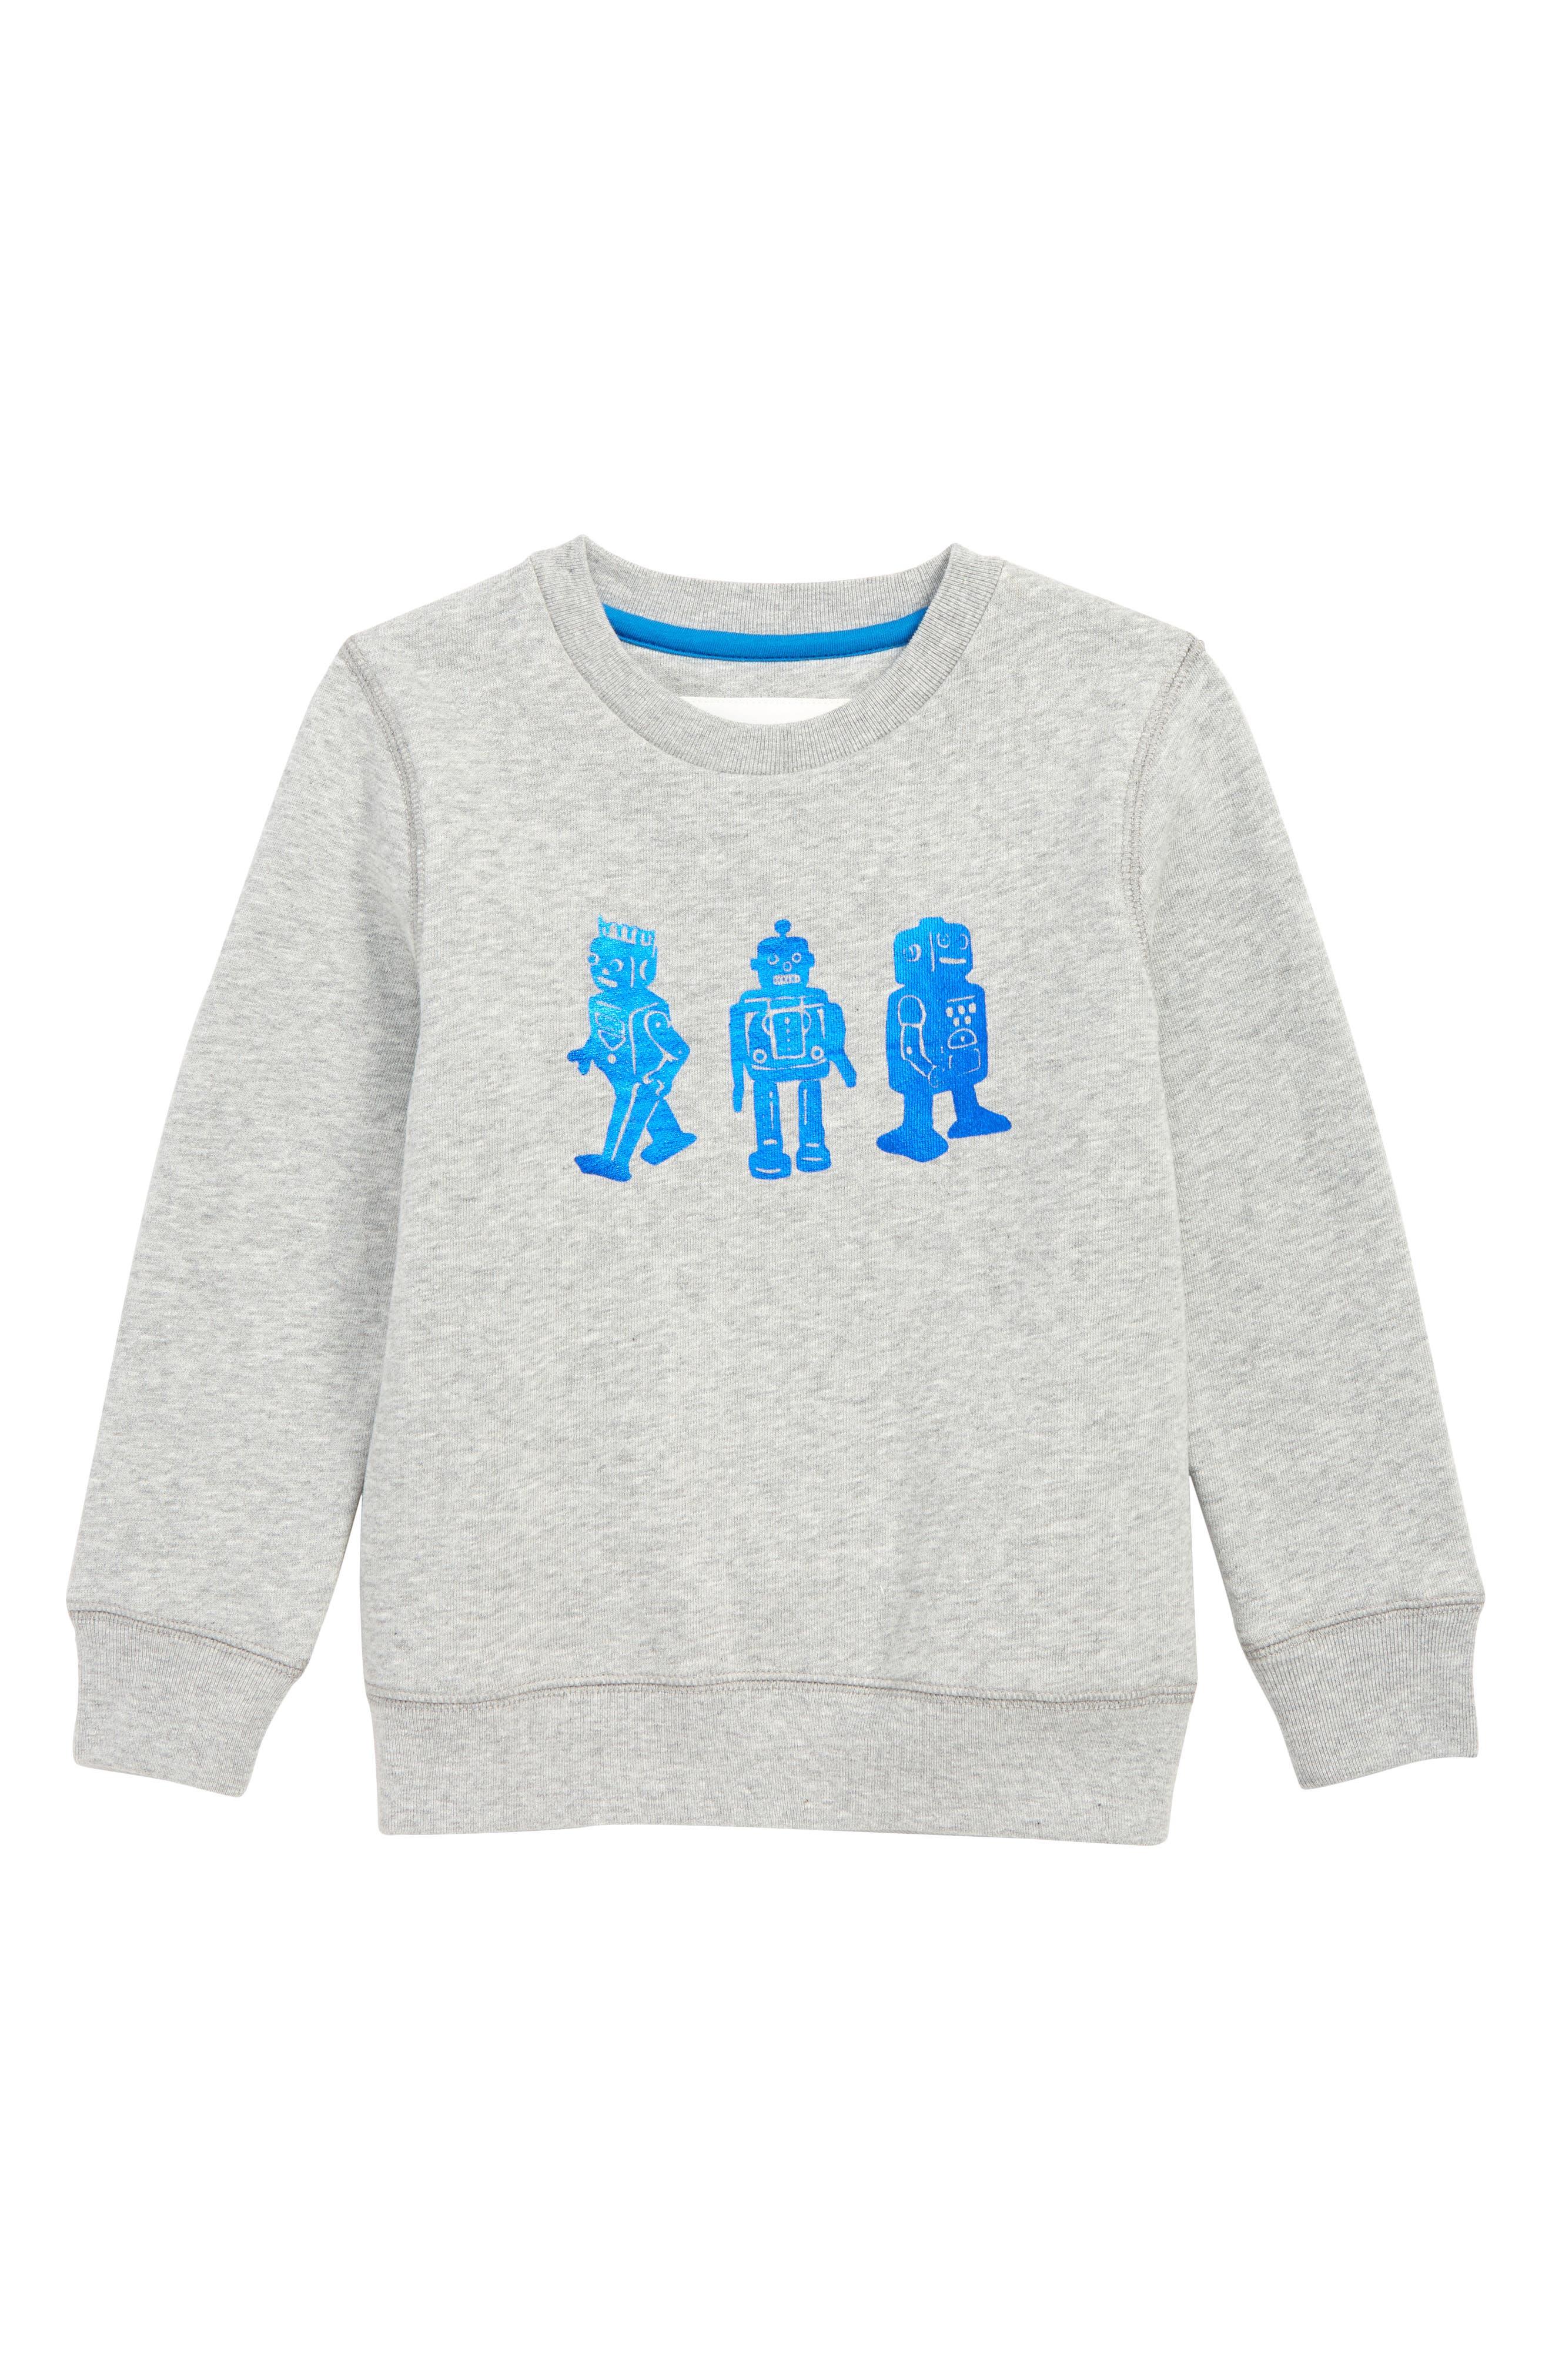 Boys Mini Boden Toy Robot Sweatshirt